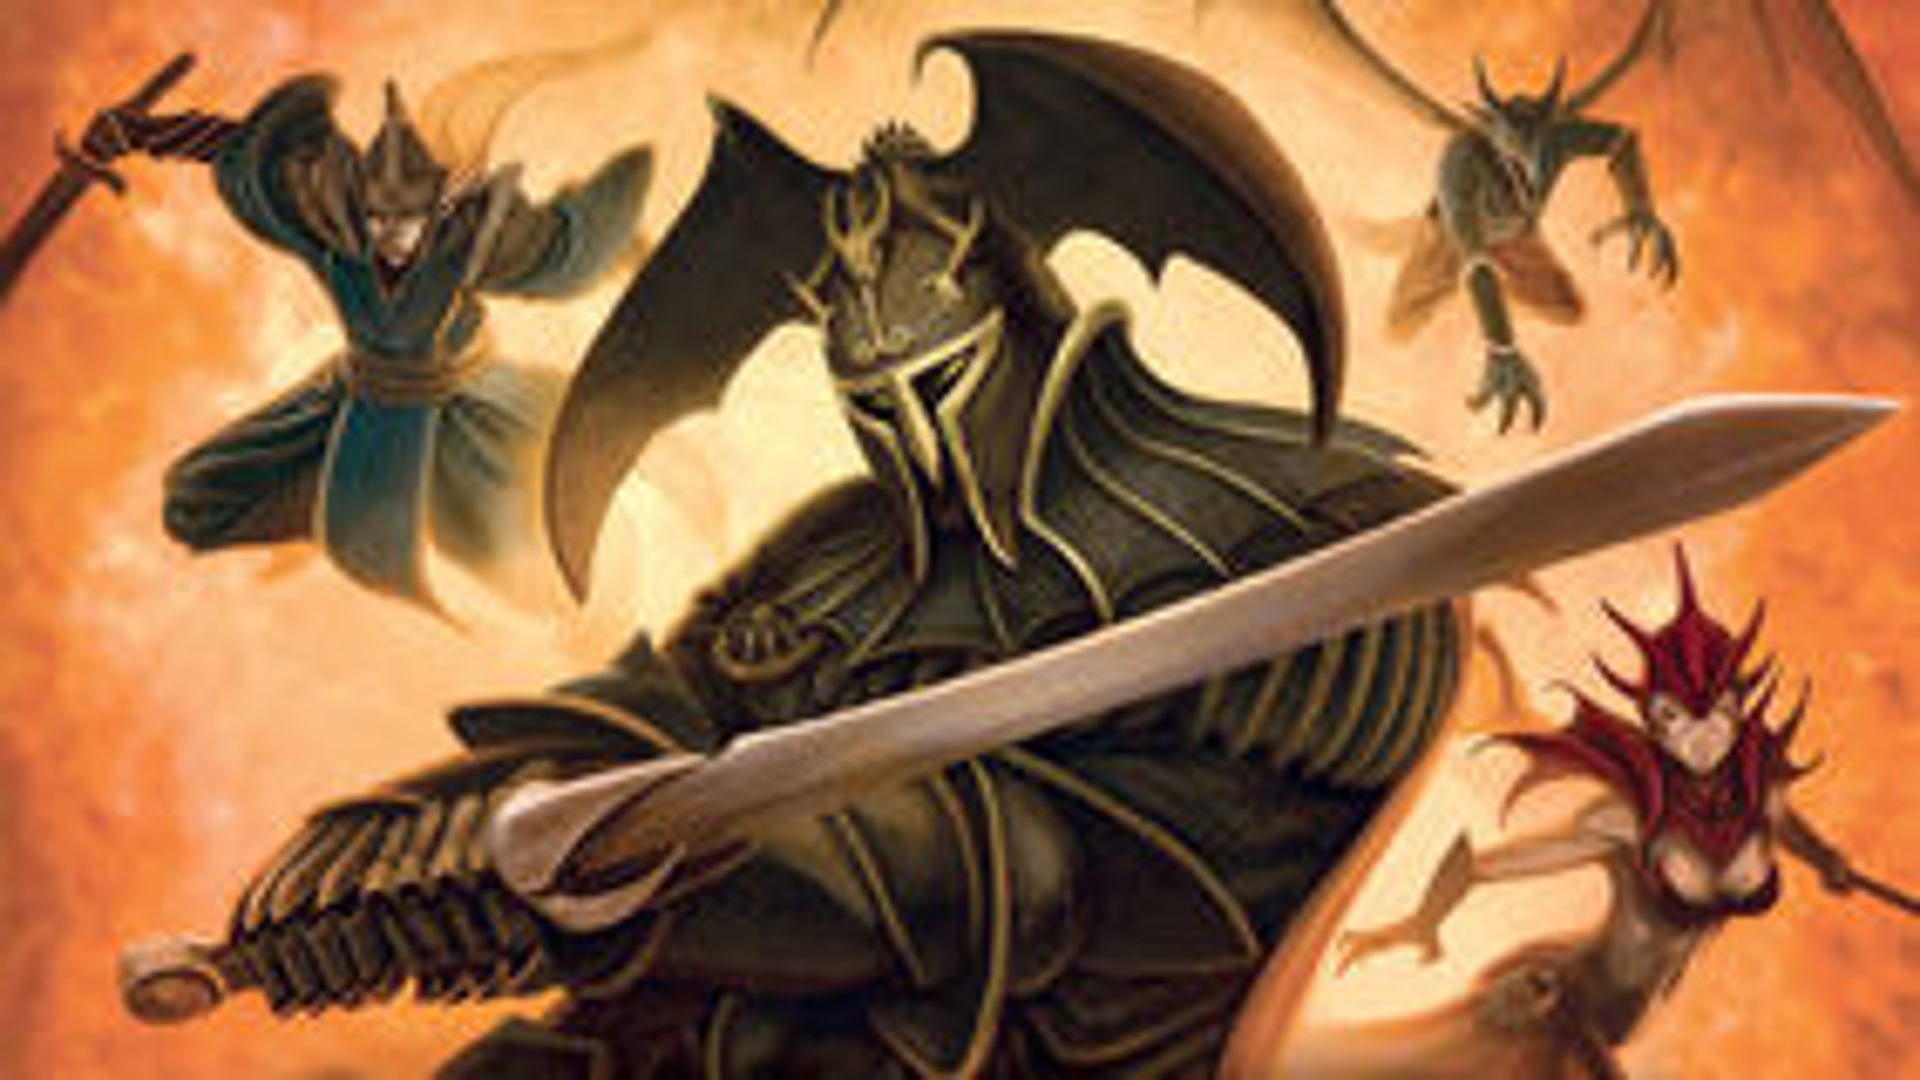 Mage Knight board game artwork